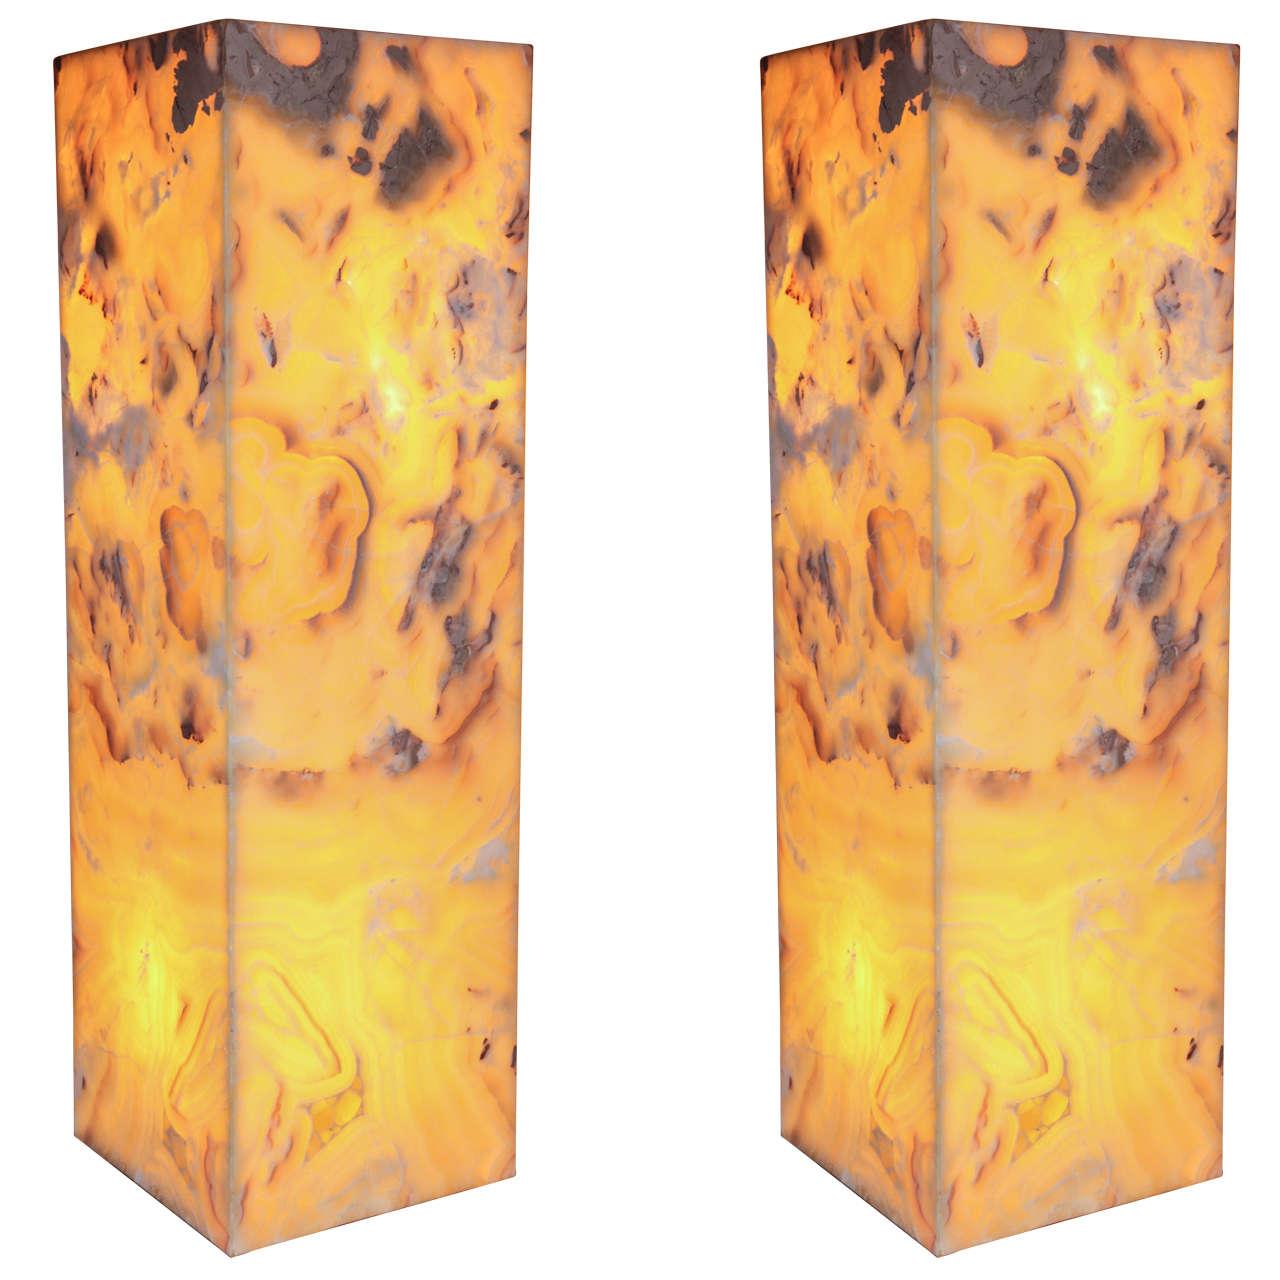 Pair of Onyx Pedestal Lamps